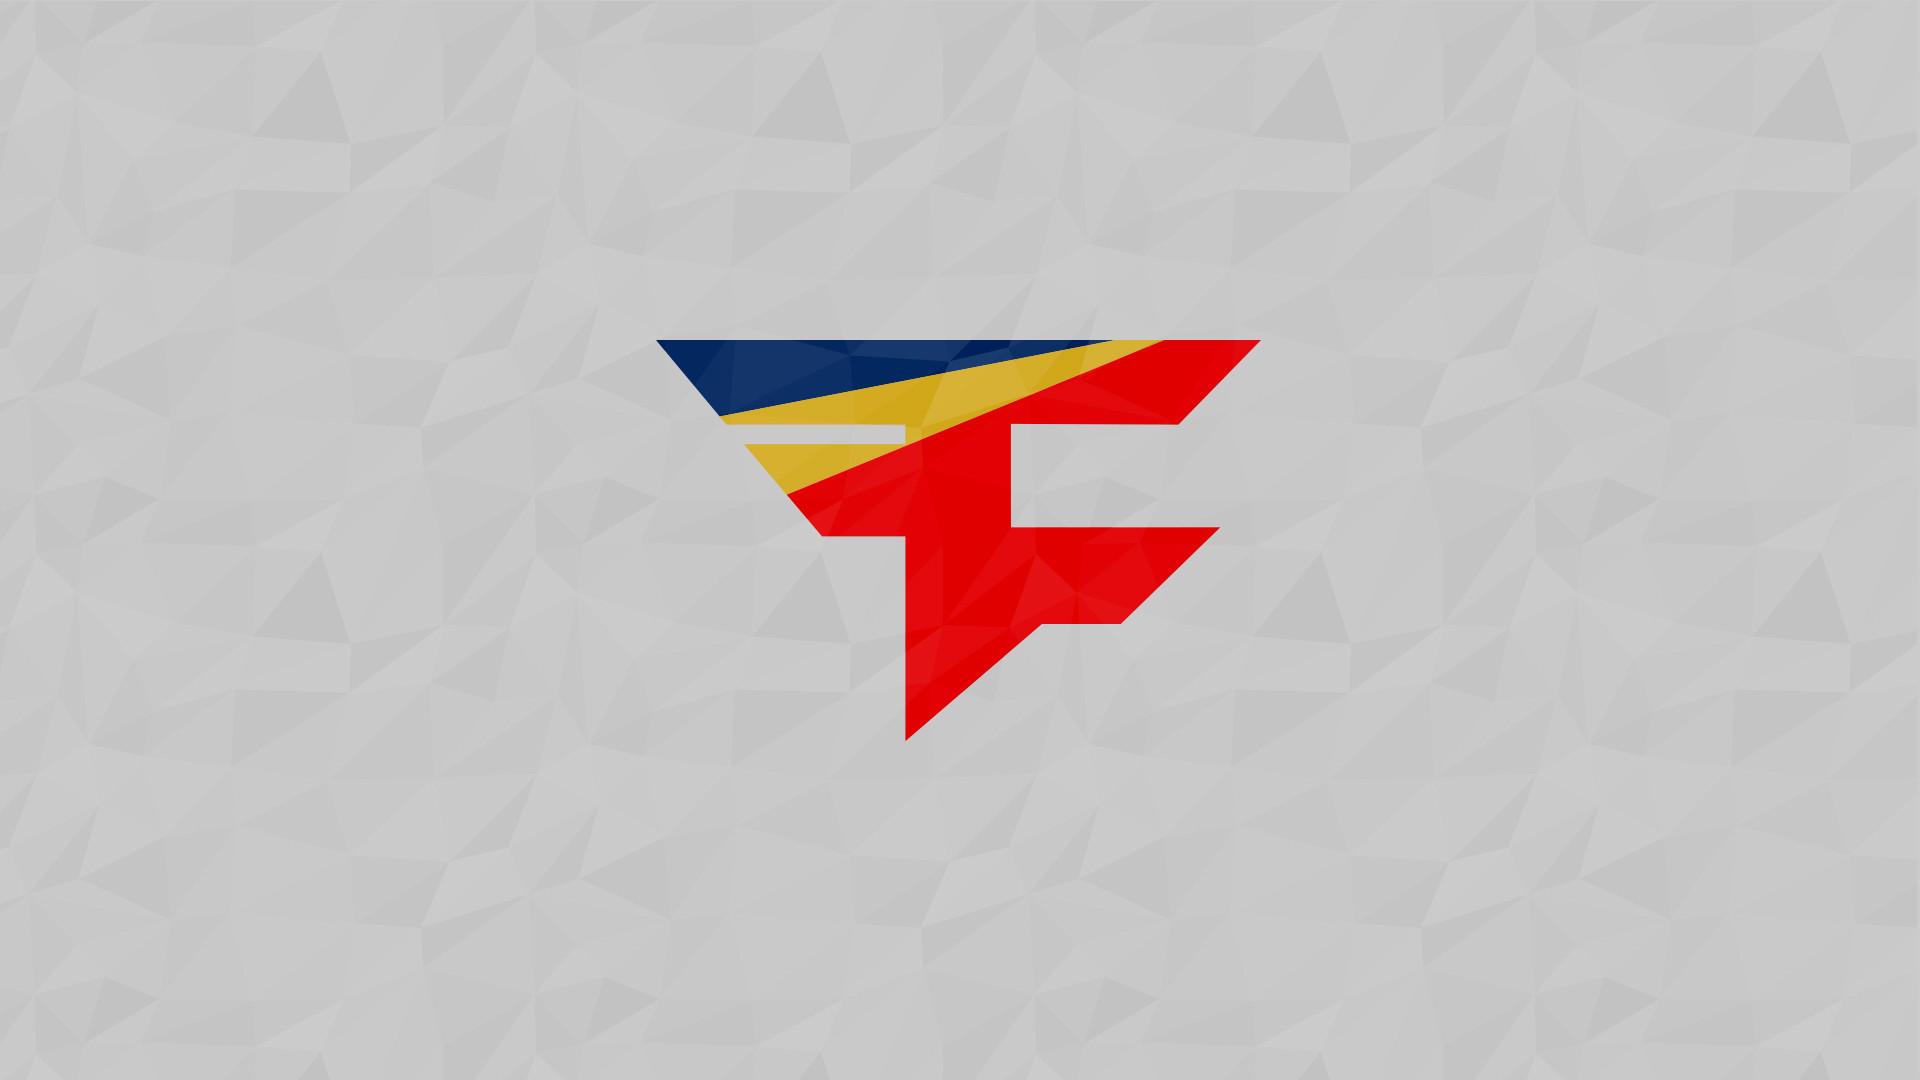 FaZe Polygon